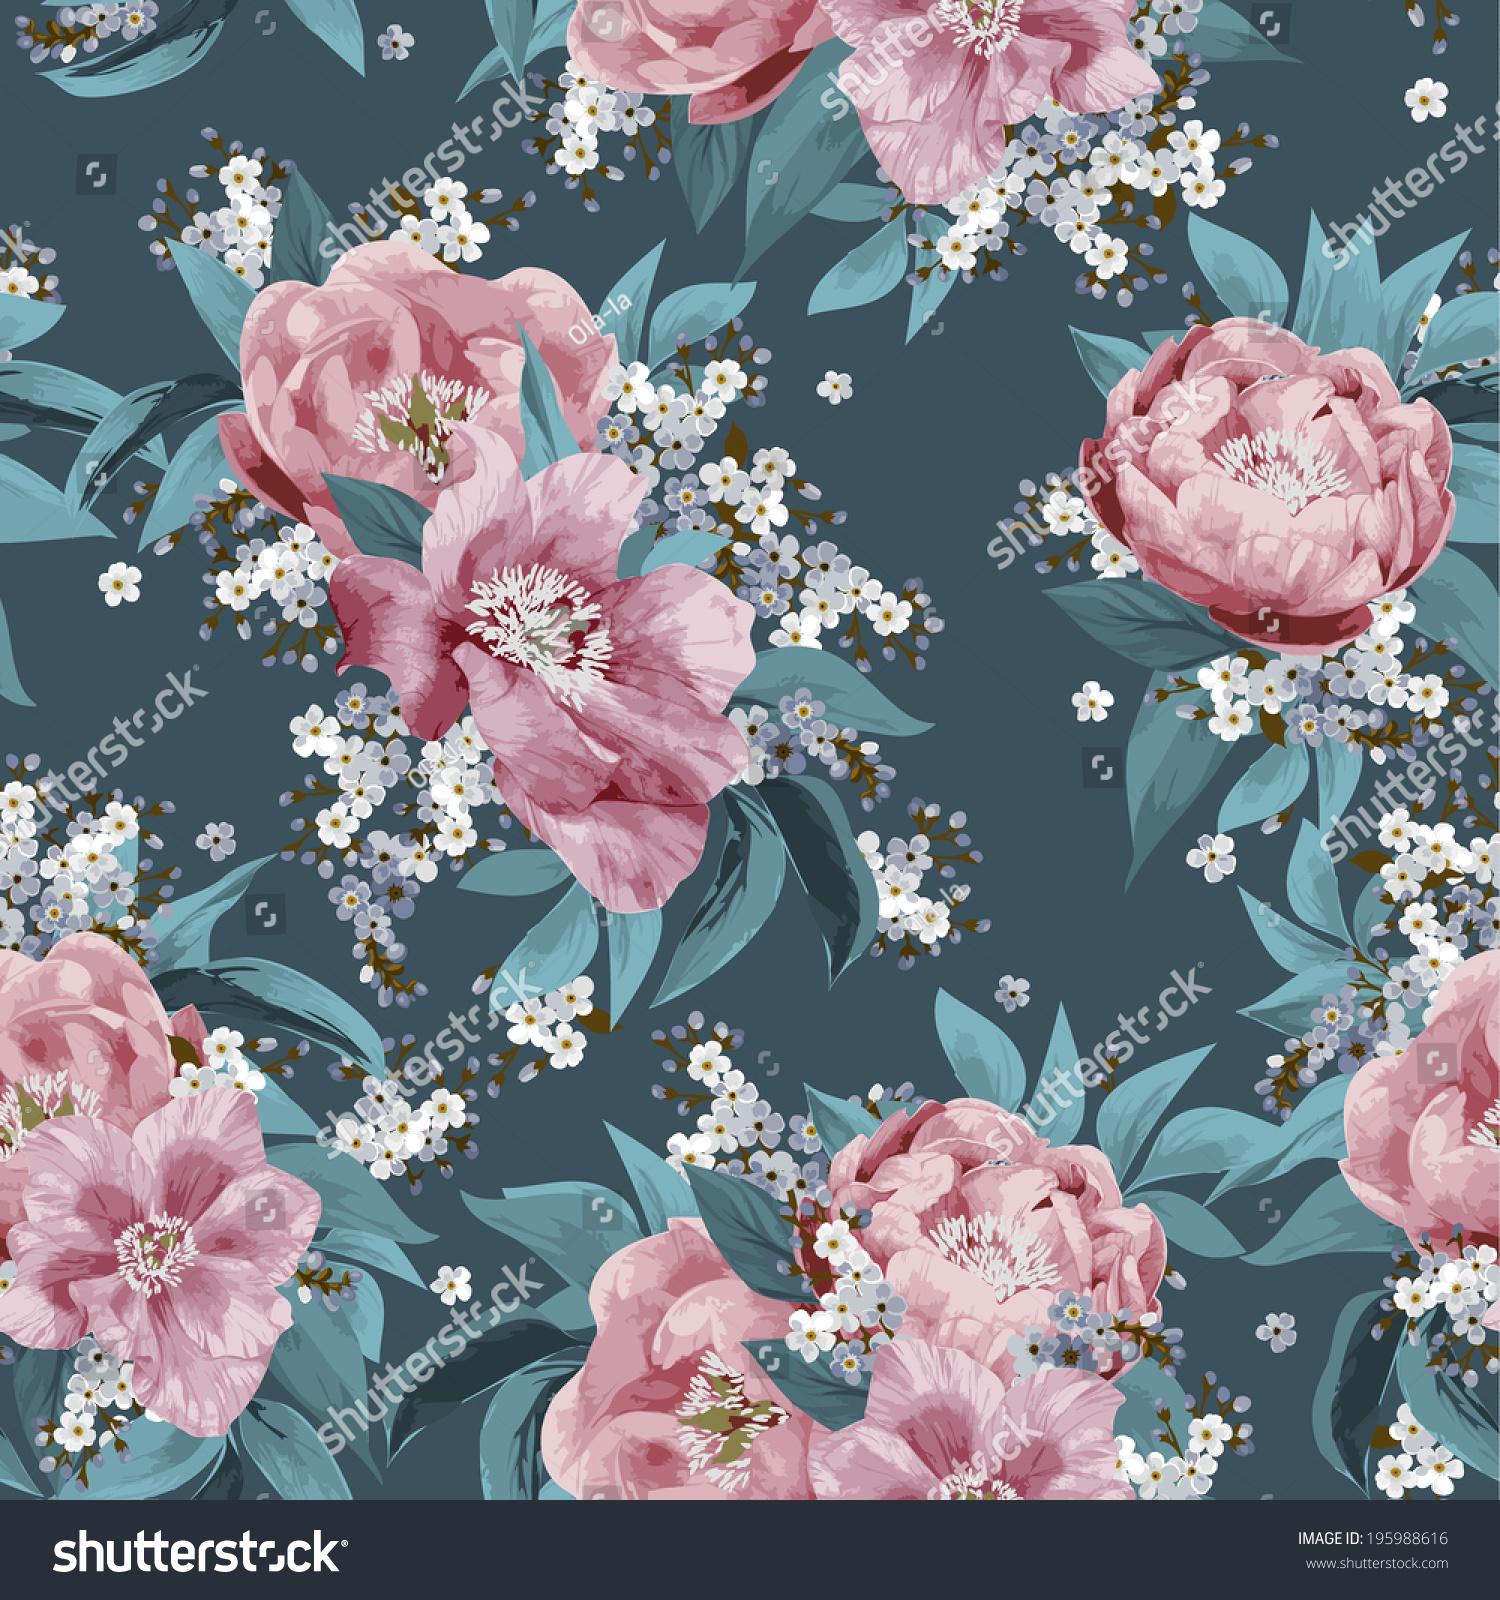 Pink floral seamless vector background floral hrysanthemum seamless - Seamless Floral Pattern With Pink Roses On Dark Background Vector Illustration